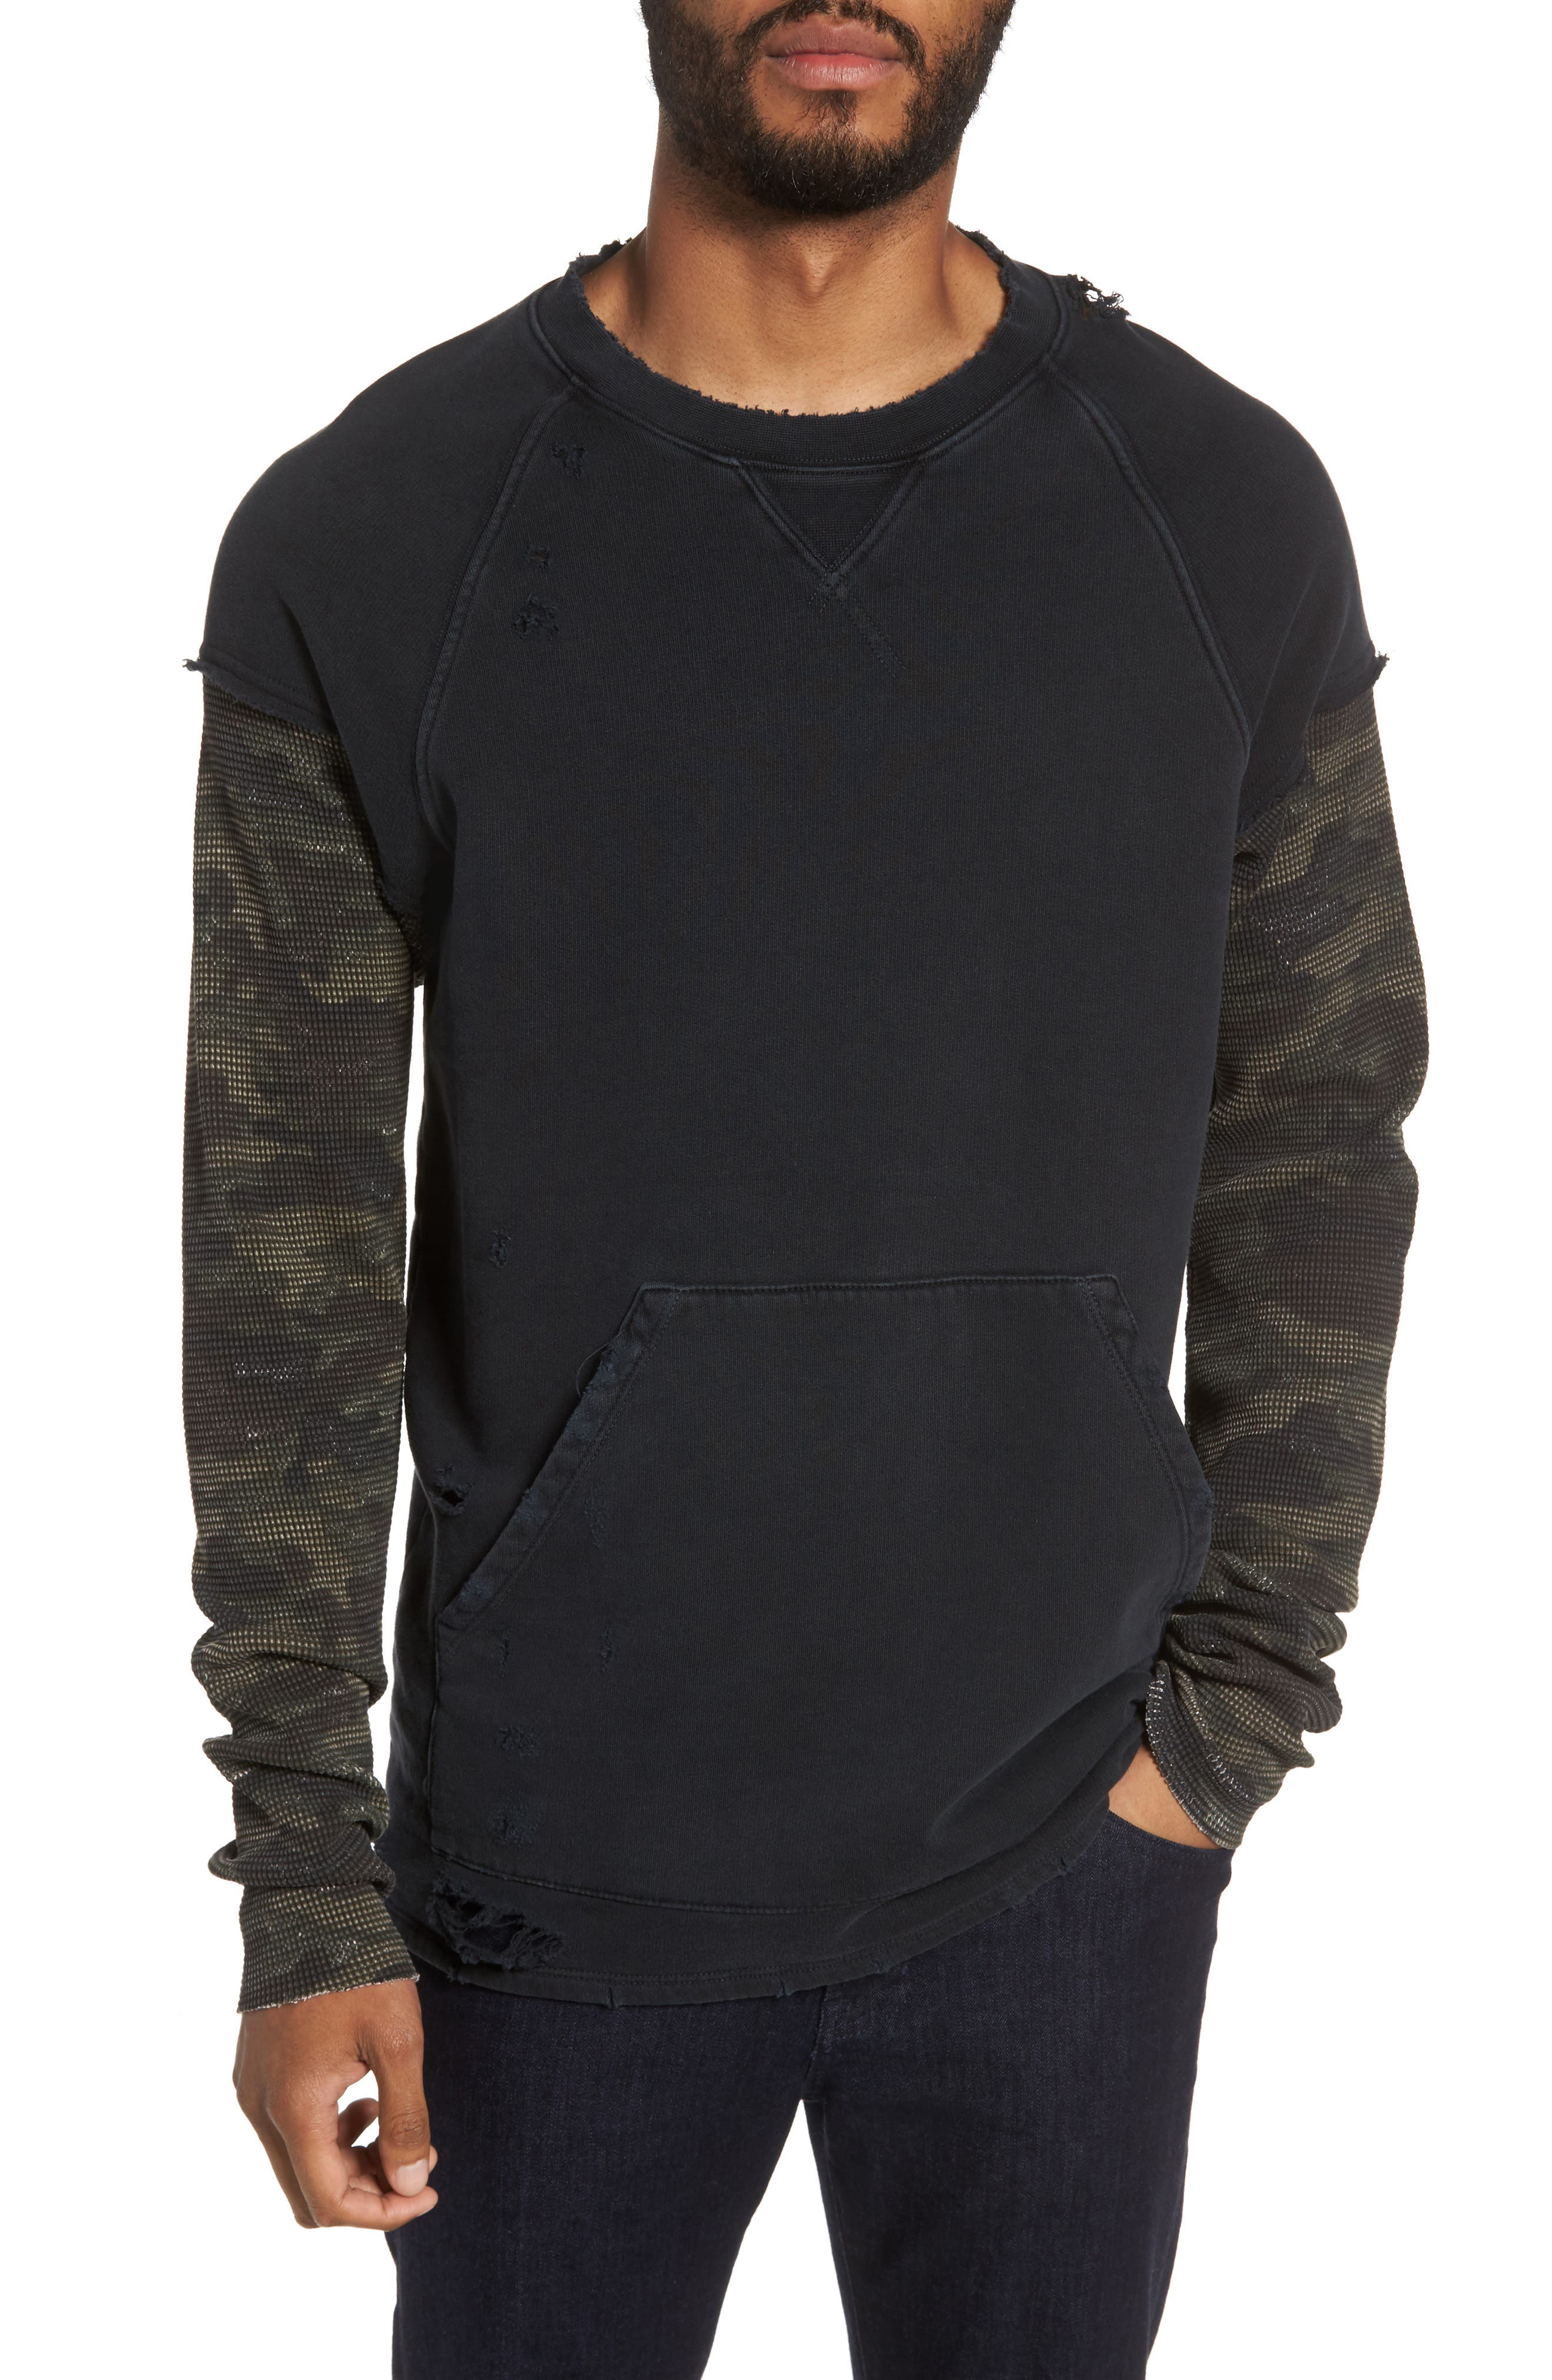 Striker Slim Fit Crewneck Sweatshirt,                         Main,                         color,